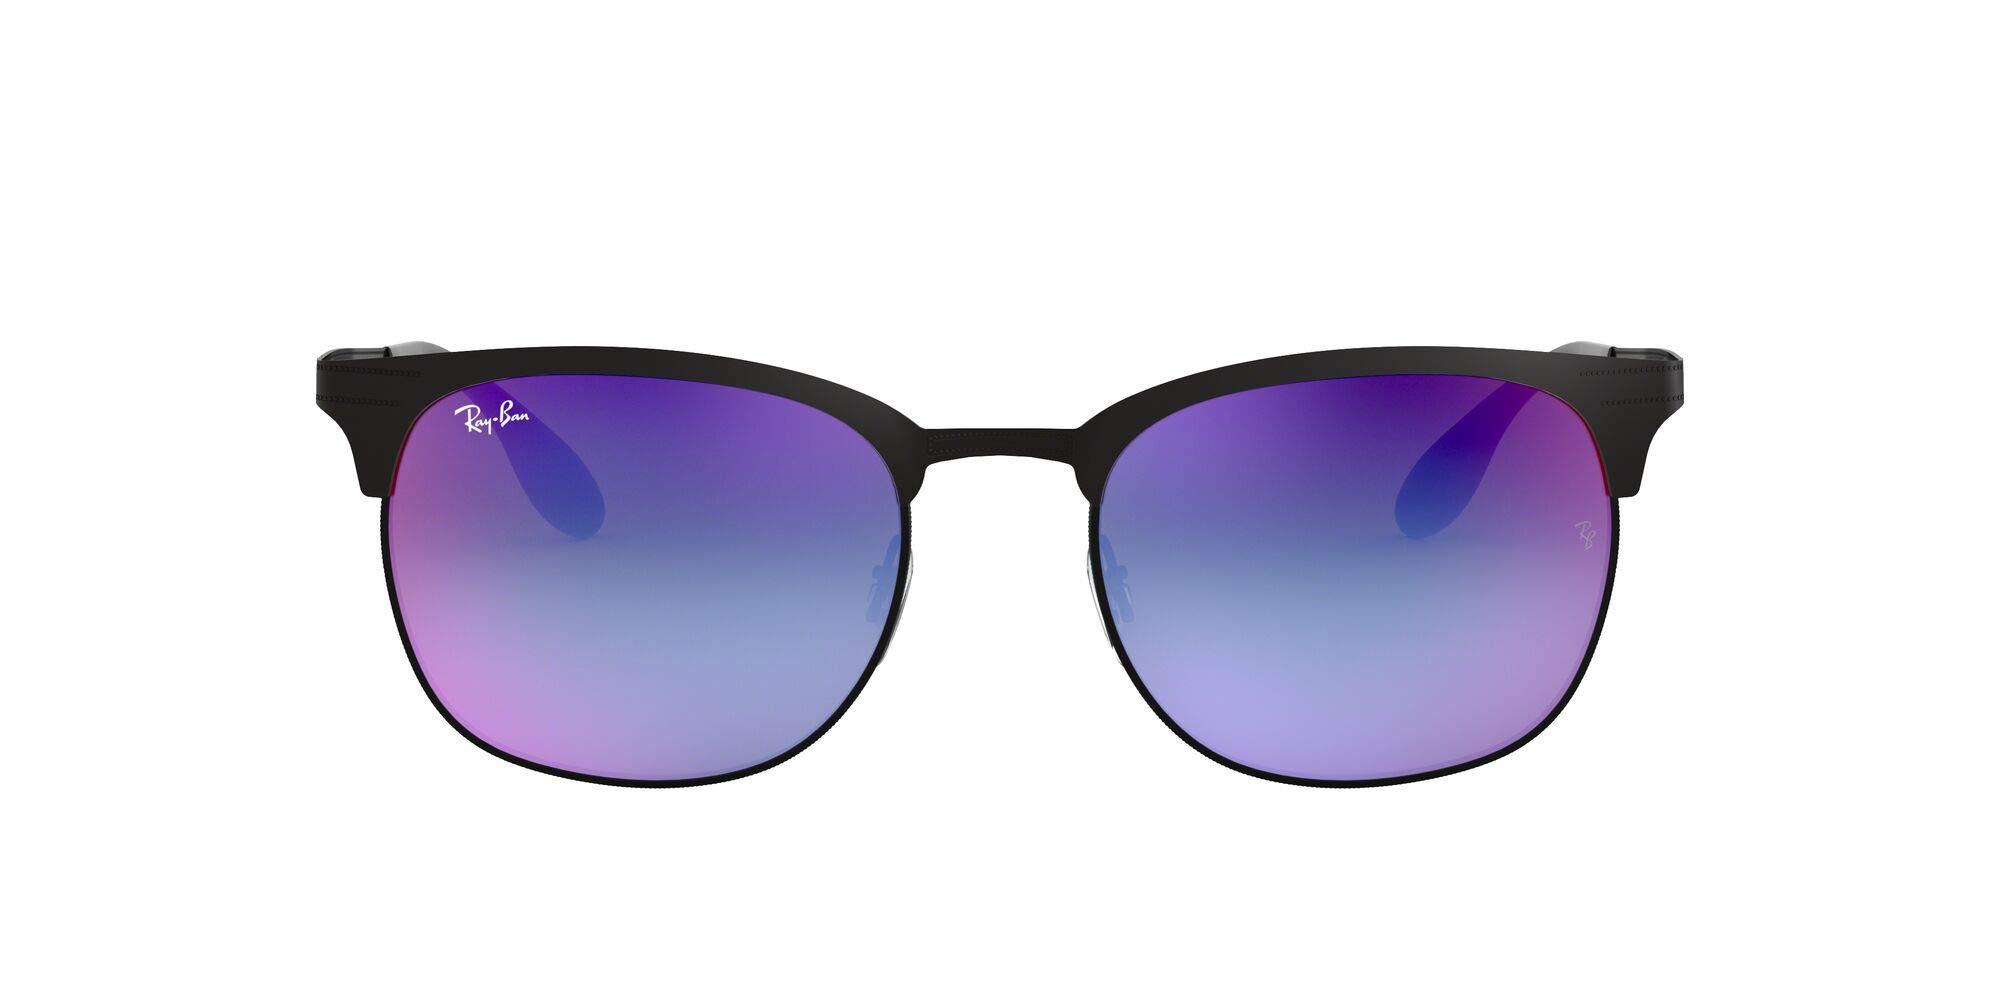 Ray-Ban unisex-adult Rb3538 Square Metal Sunglasses Square Sunglasses